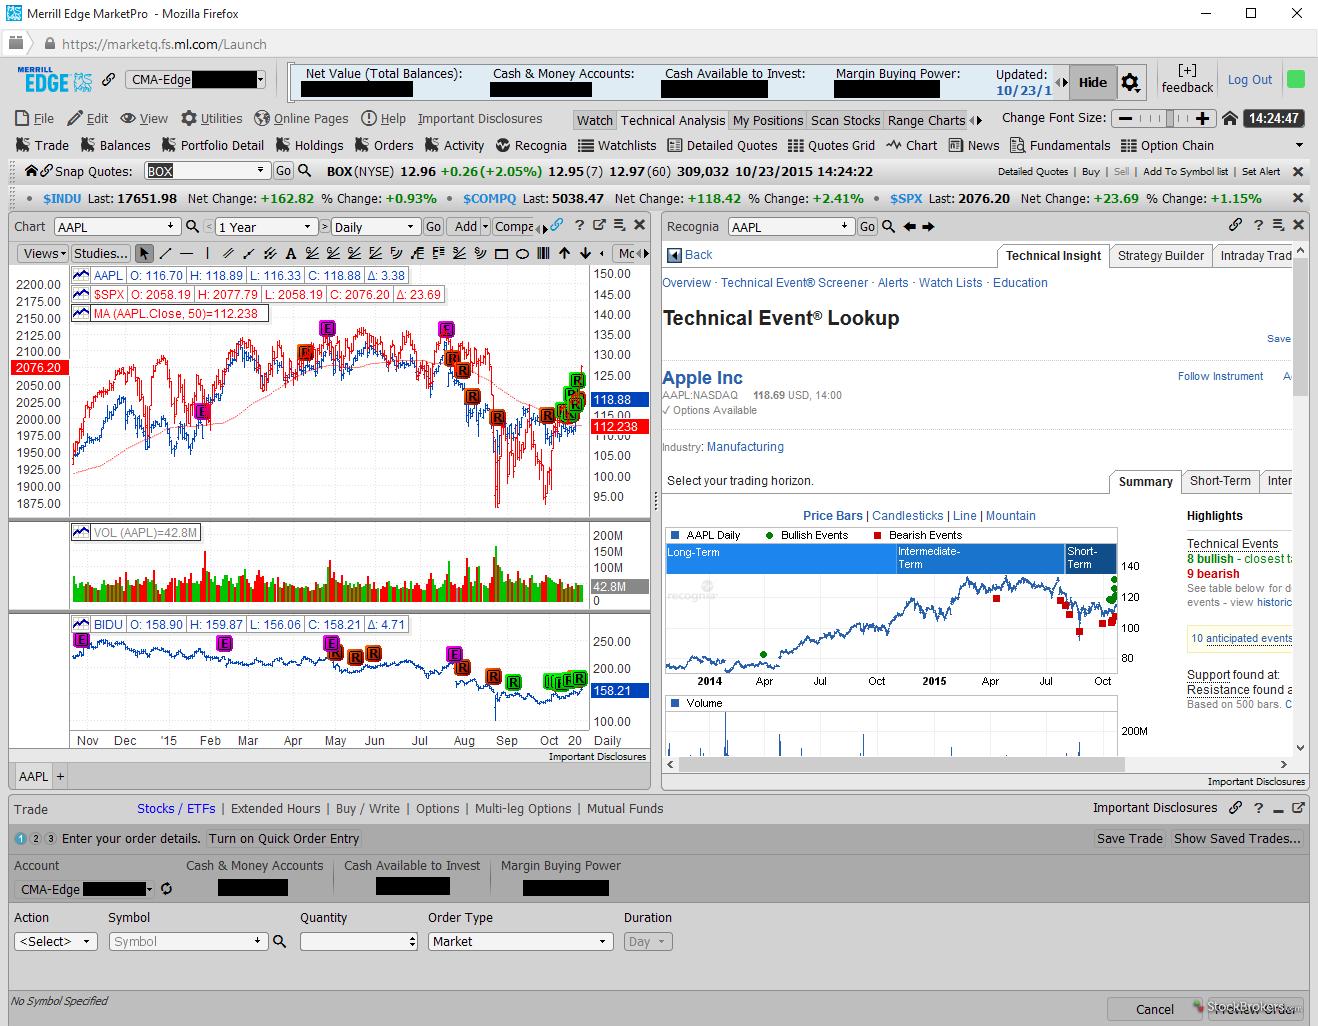 Merrill Edge MarketPro